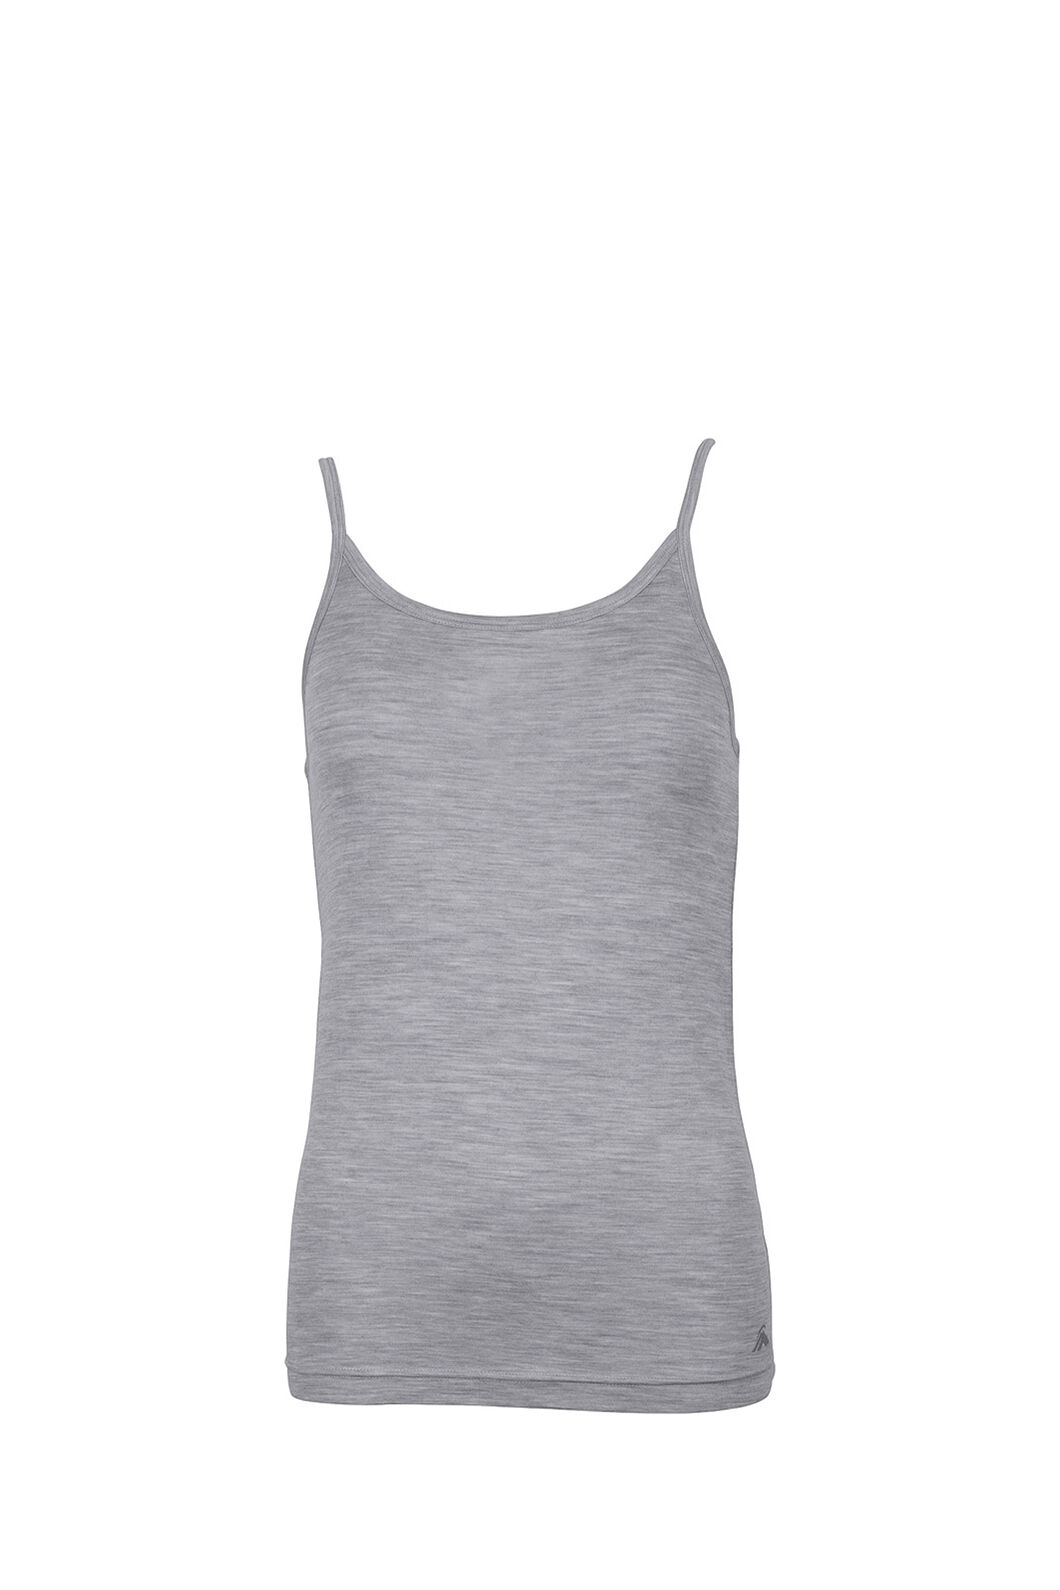 Macpac 150 Merino Camisole - Women's, Light Grey Marle, hi-res